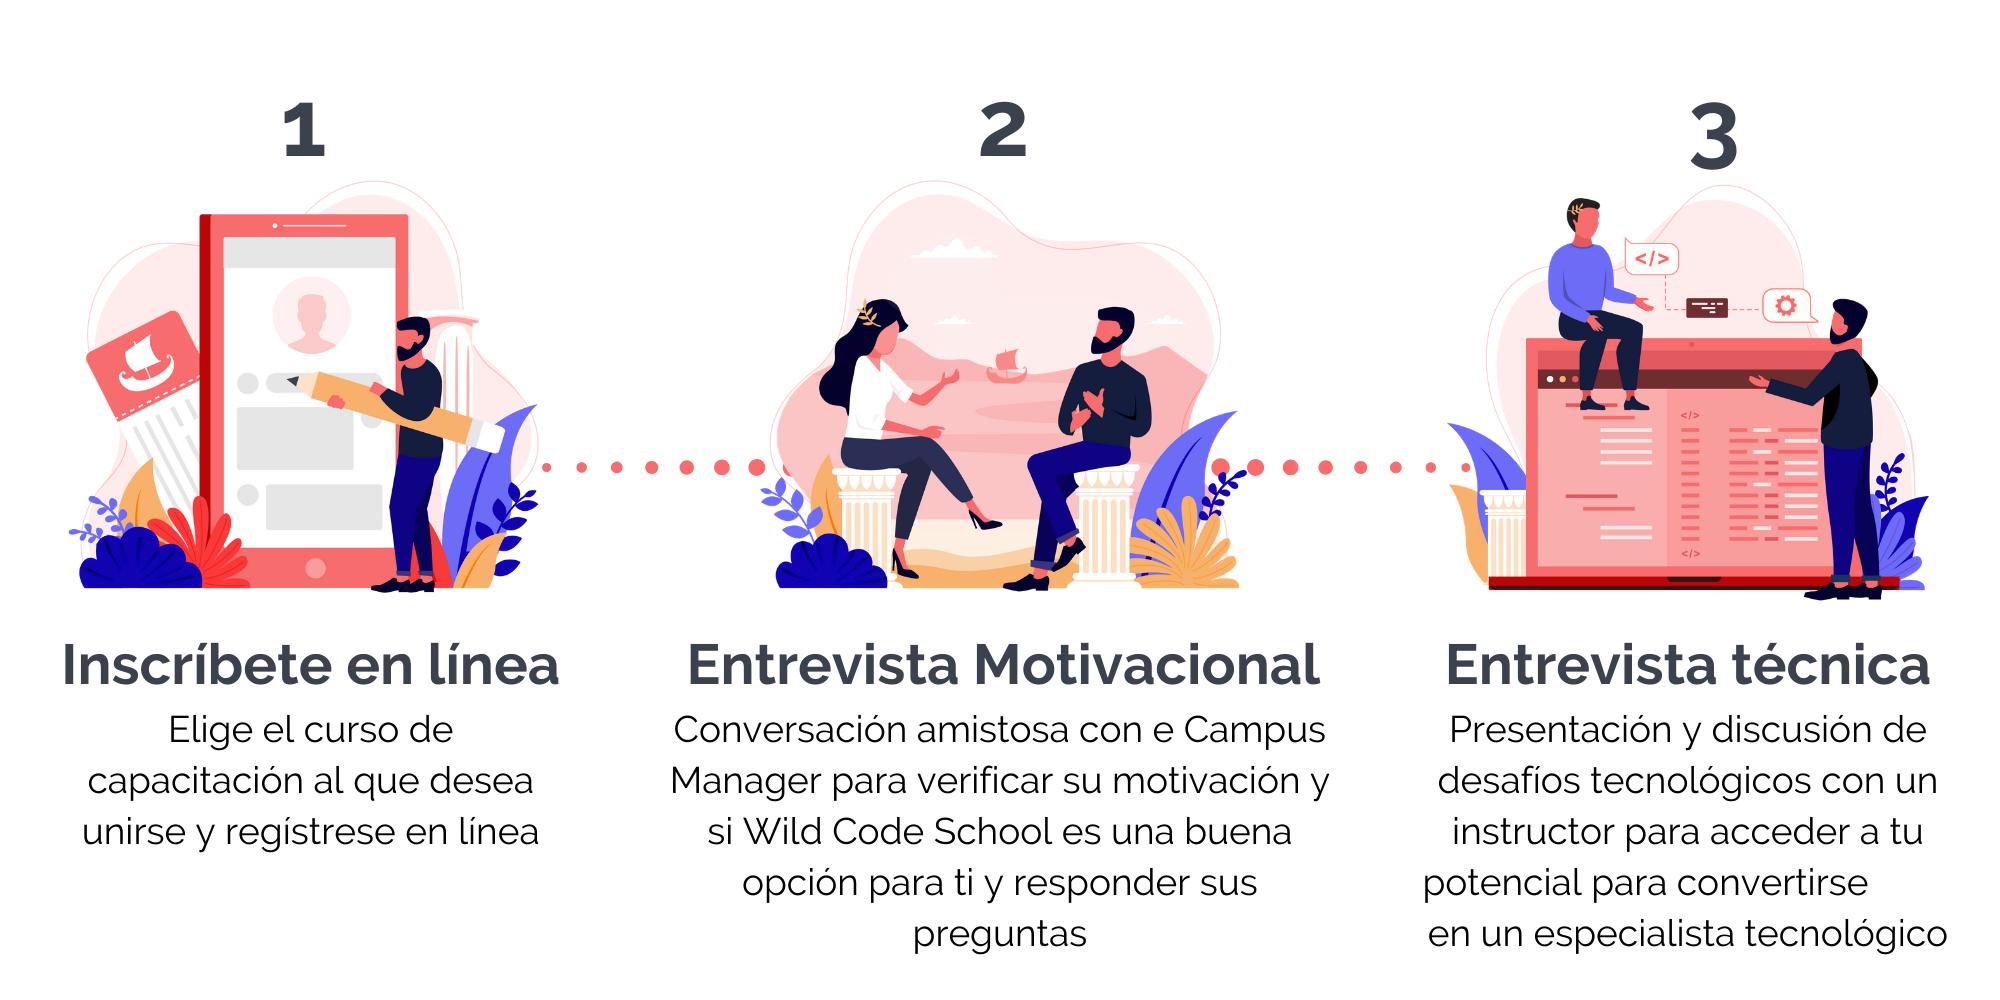 3 steps application process ES